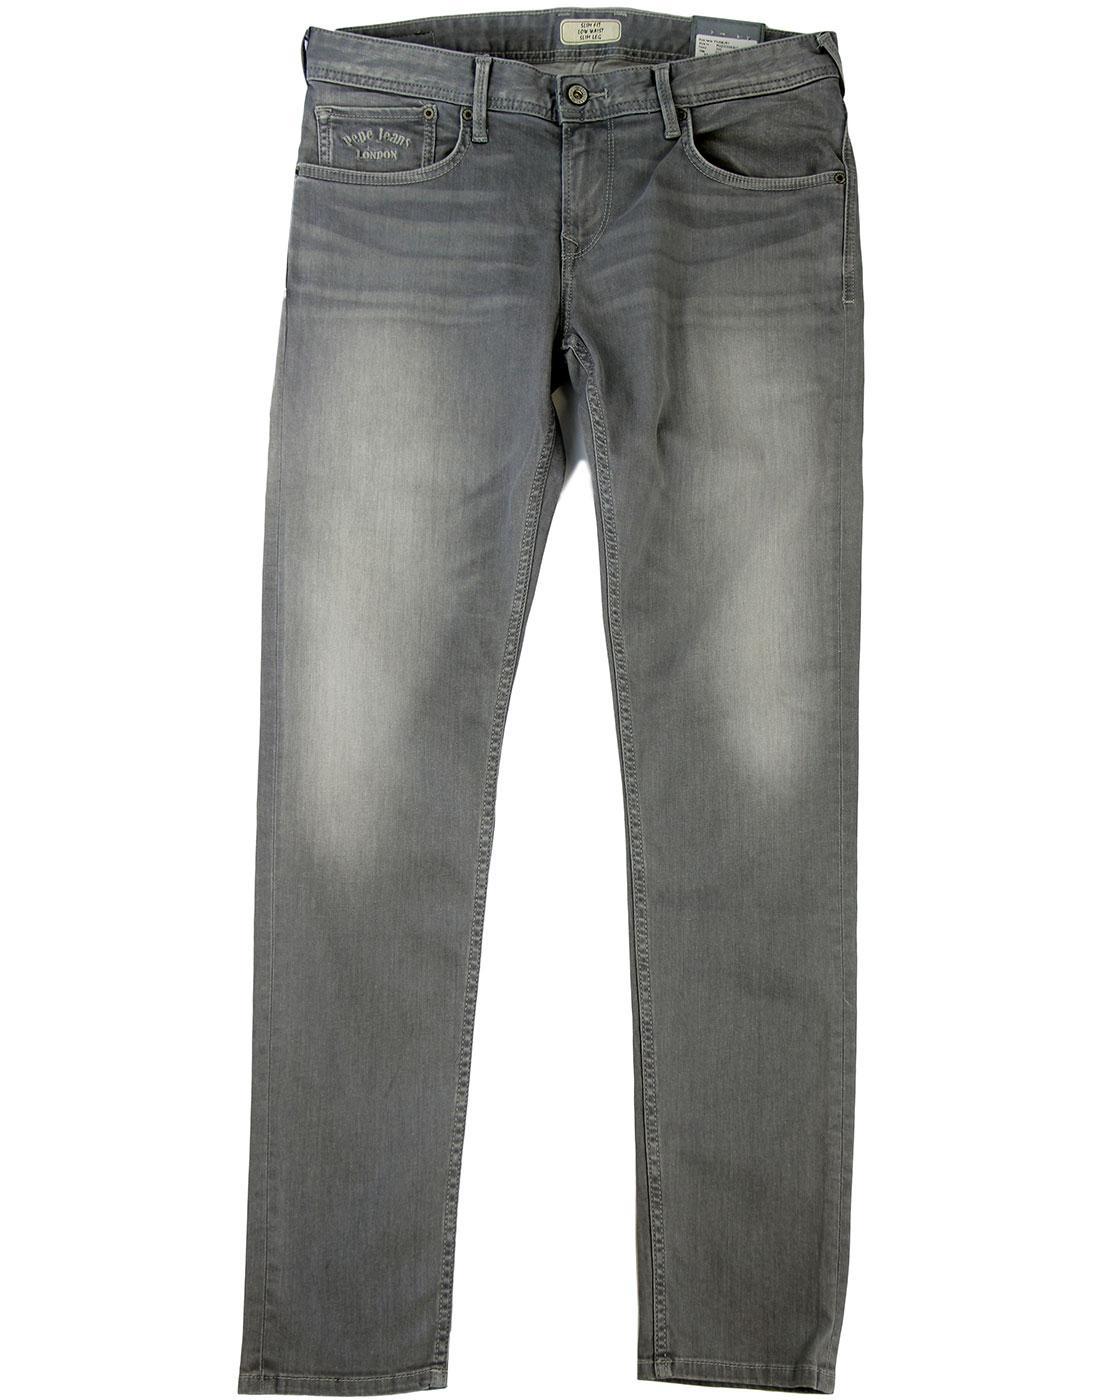 Finsbury PEPE Retro Bleached Slate Drainpipe Jeans